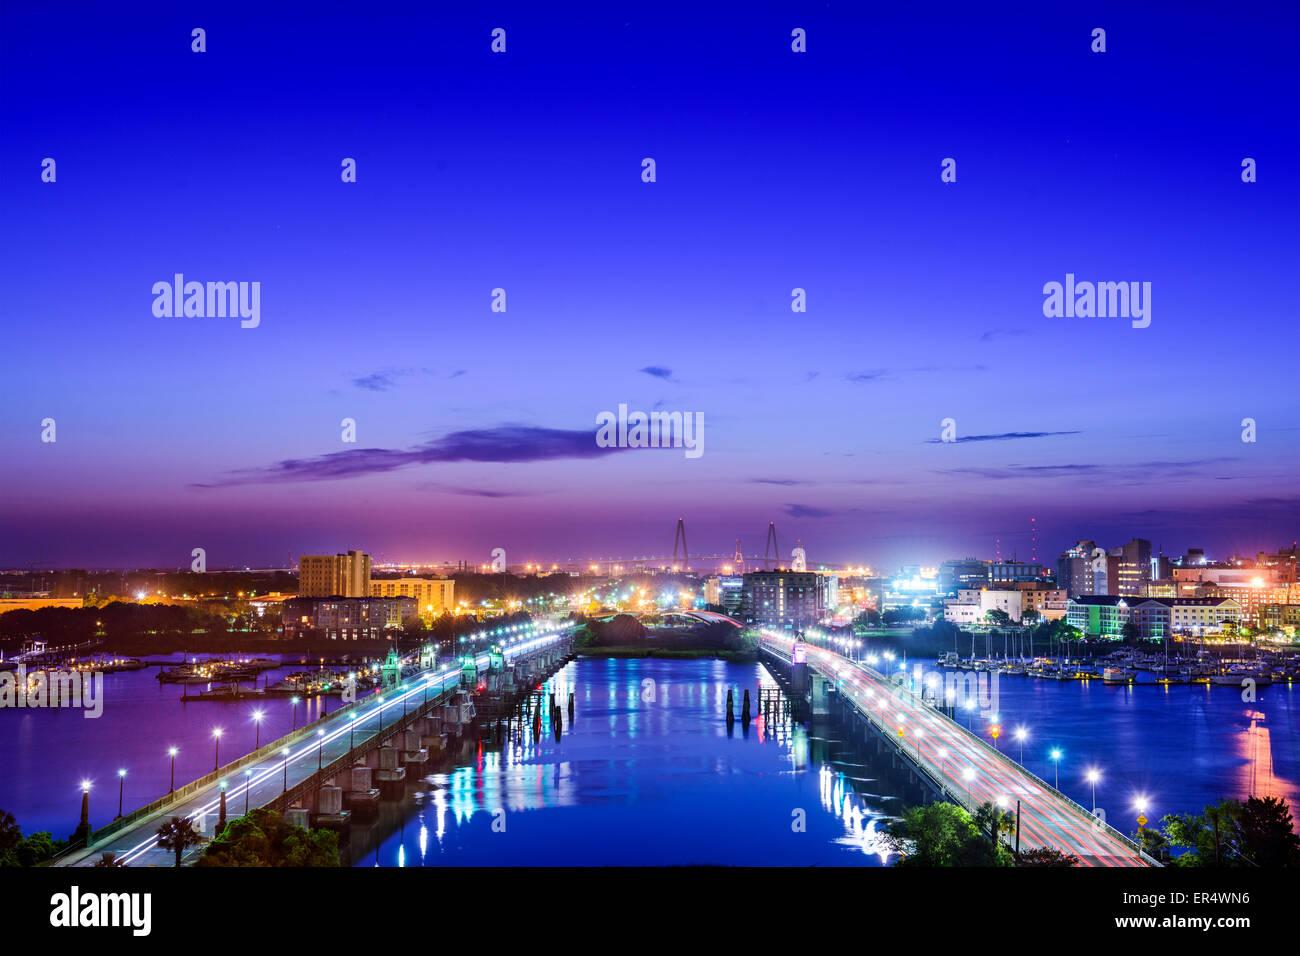 Charleston, South Carolina, USA skyline over the Ashley River. - Stock Image